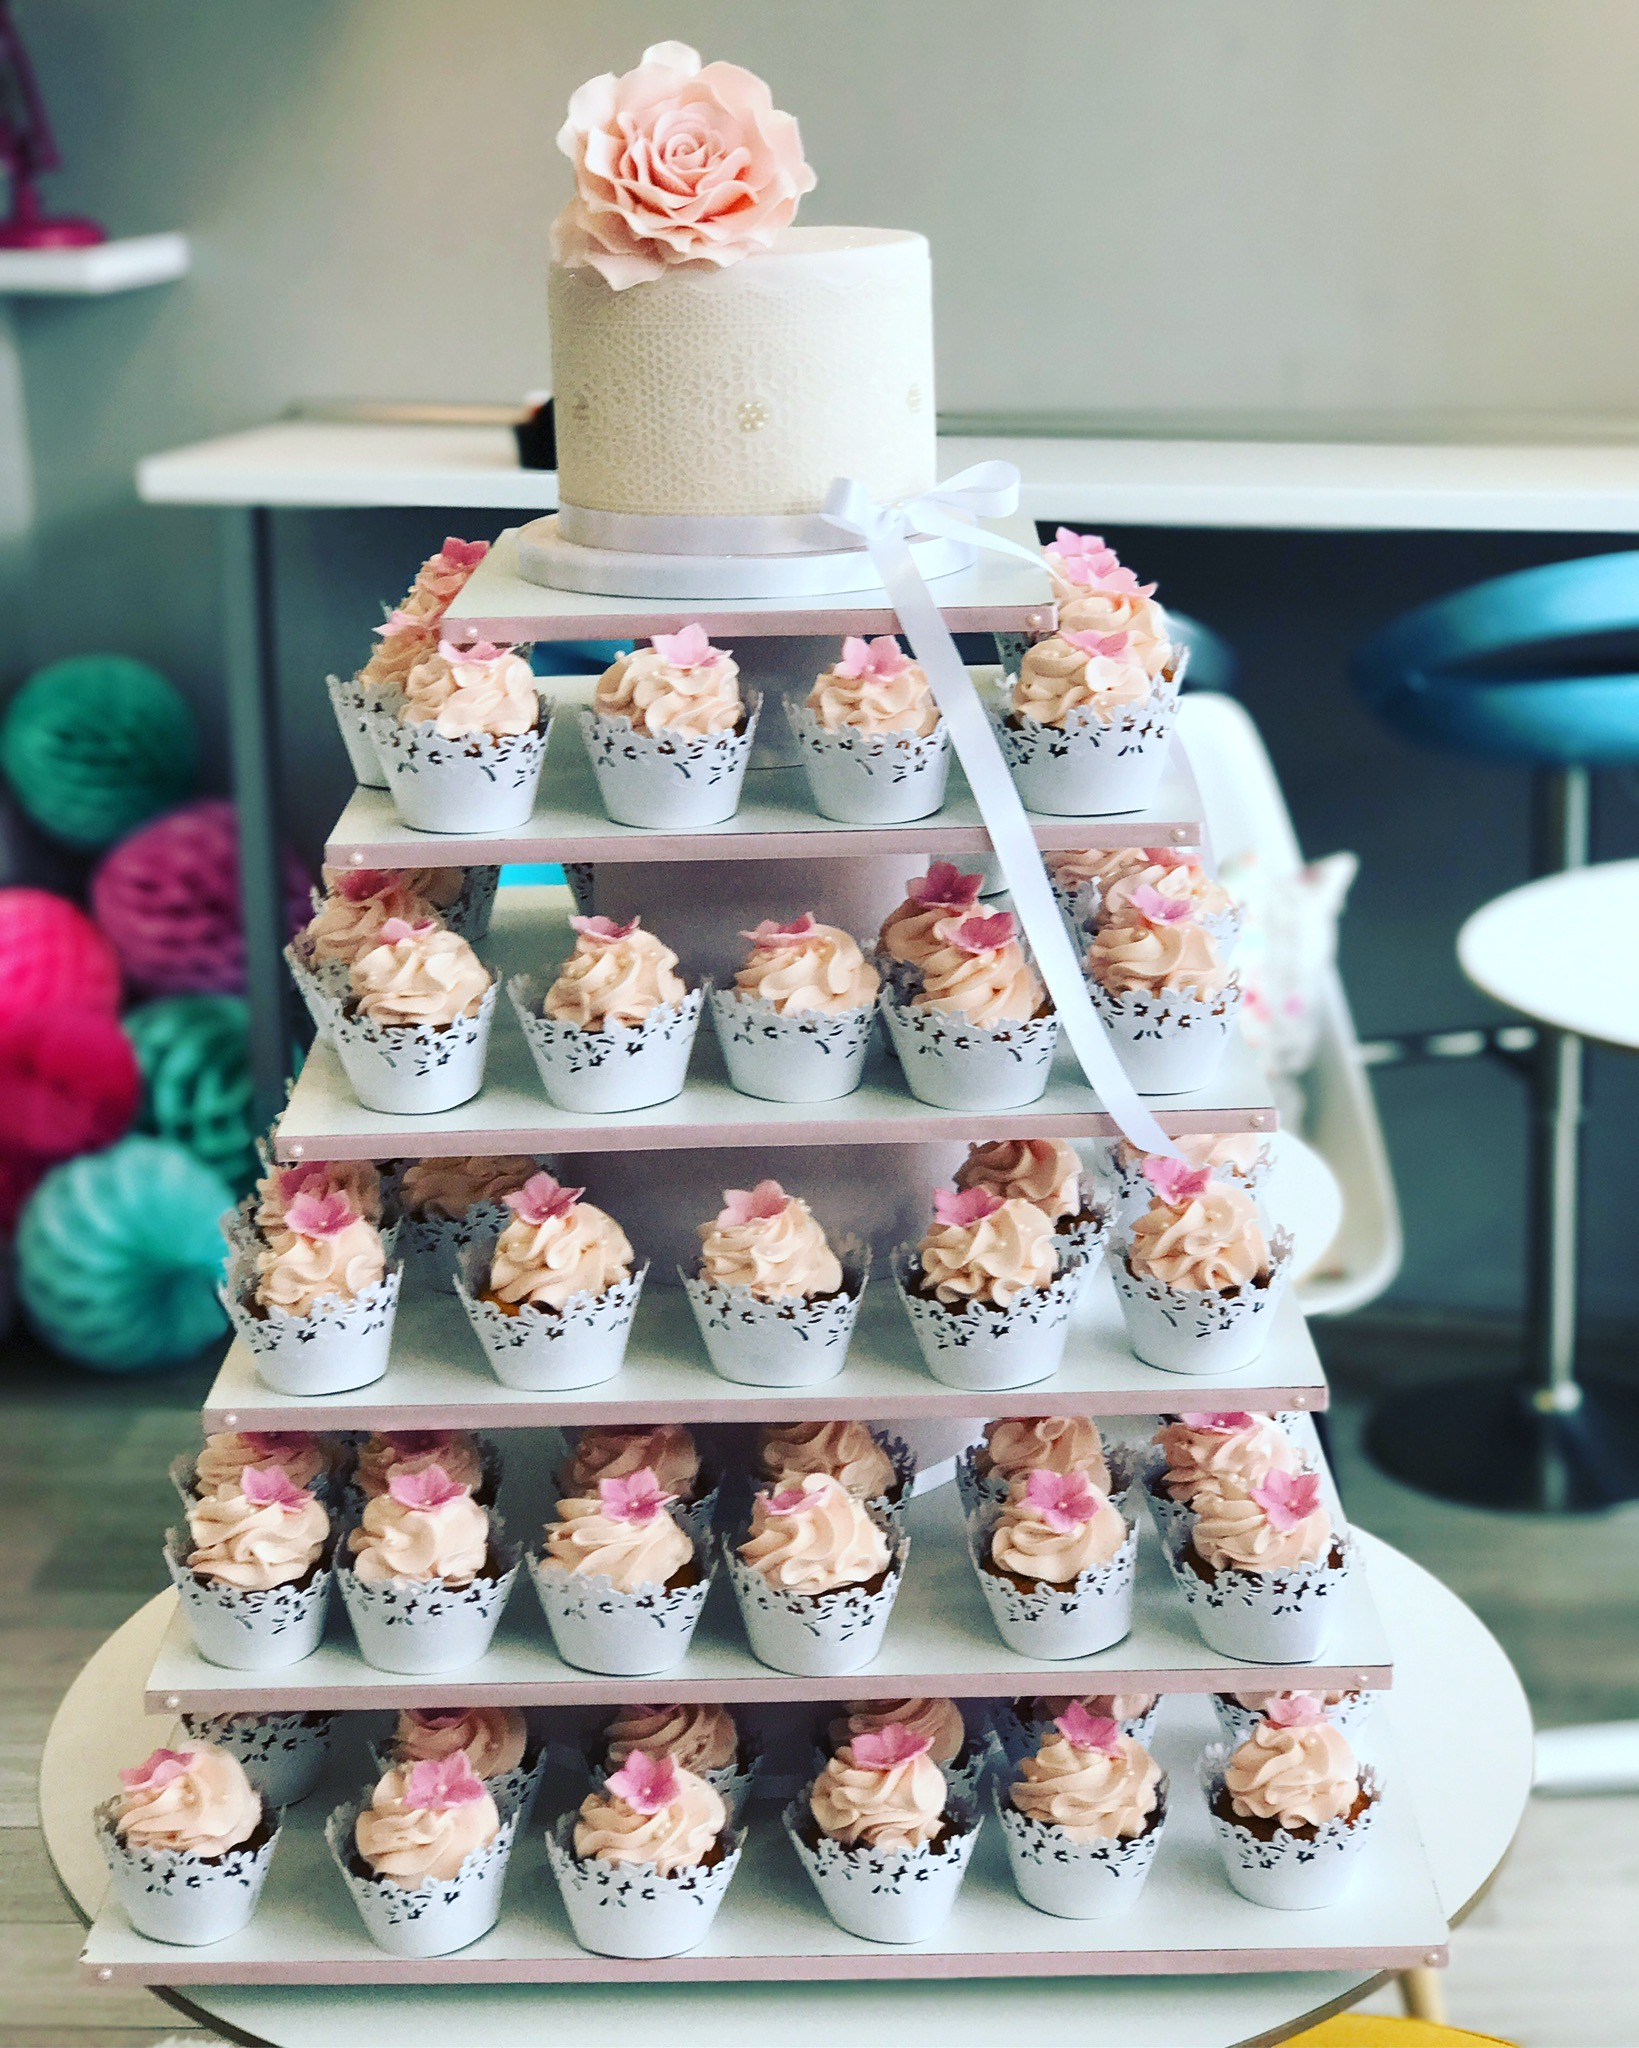 L Atelier Des Sucreries Cake Design